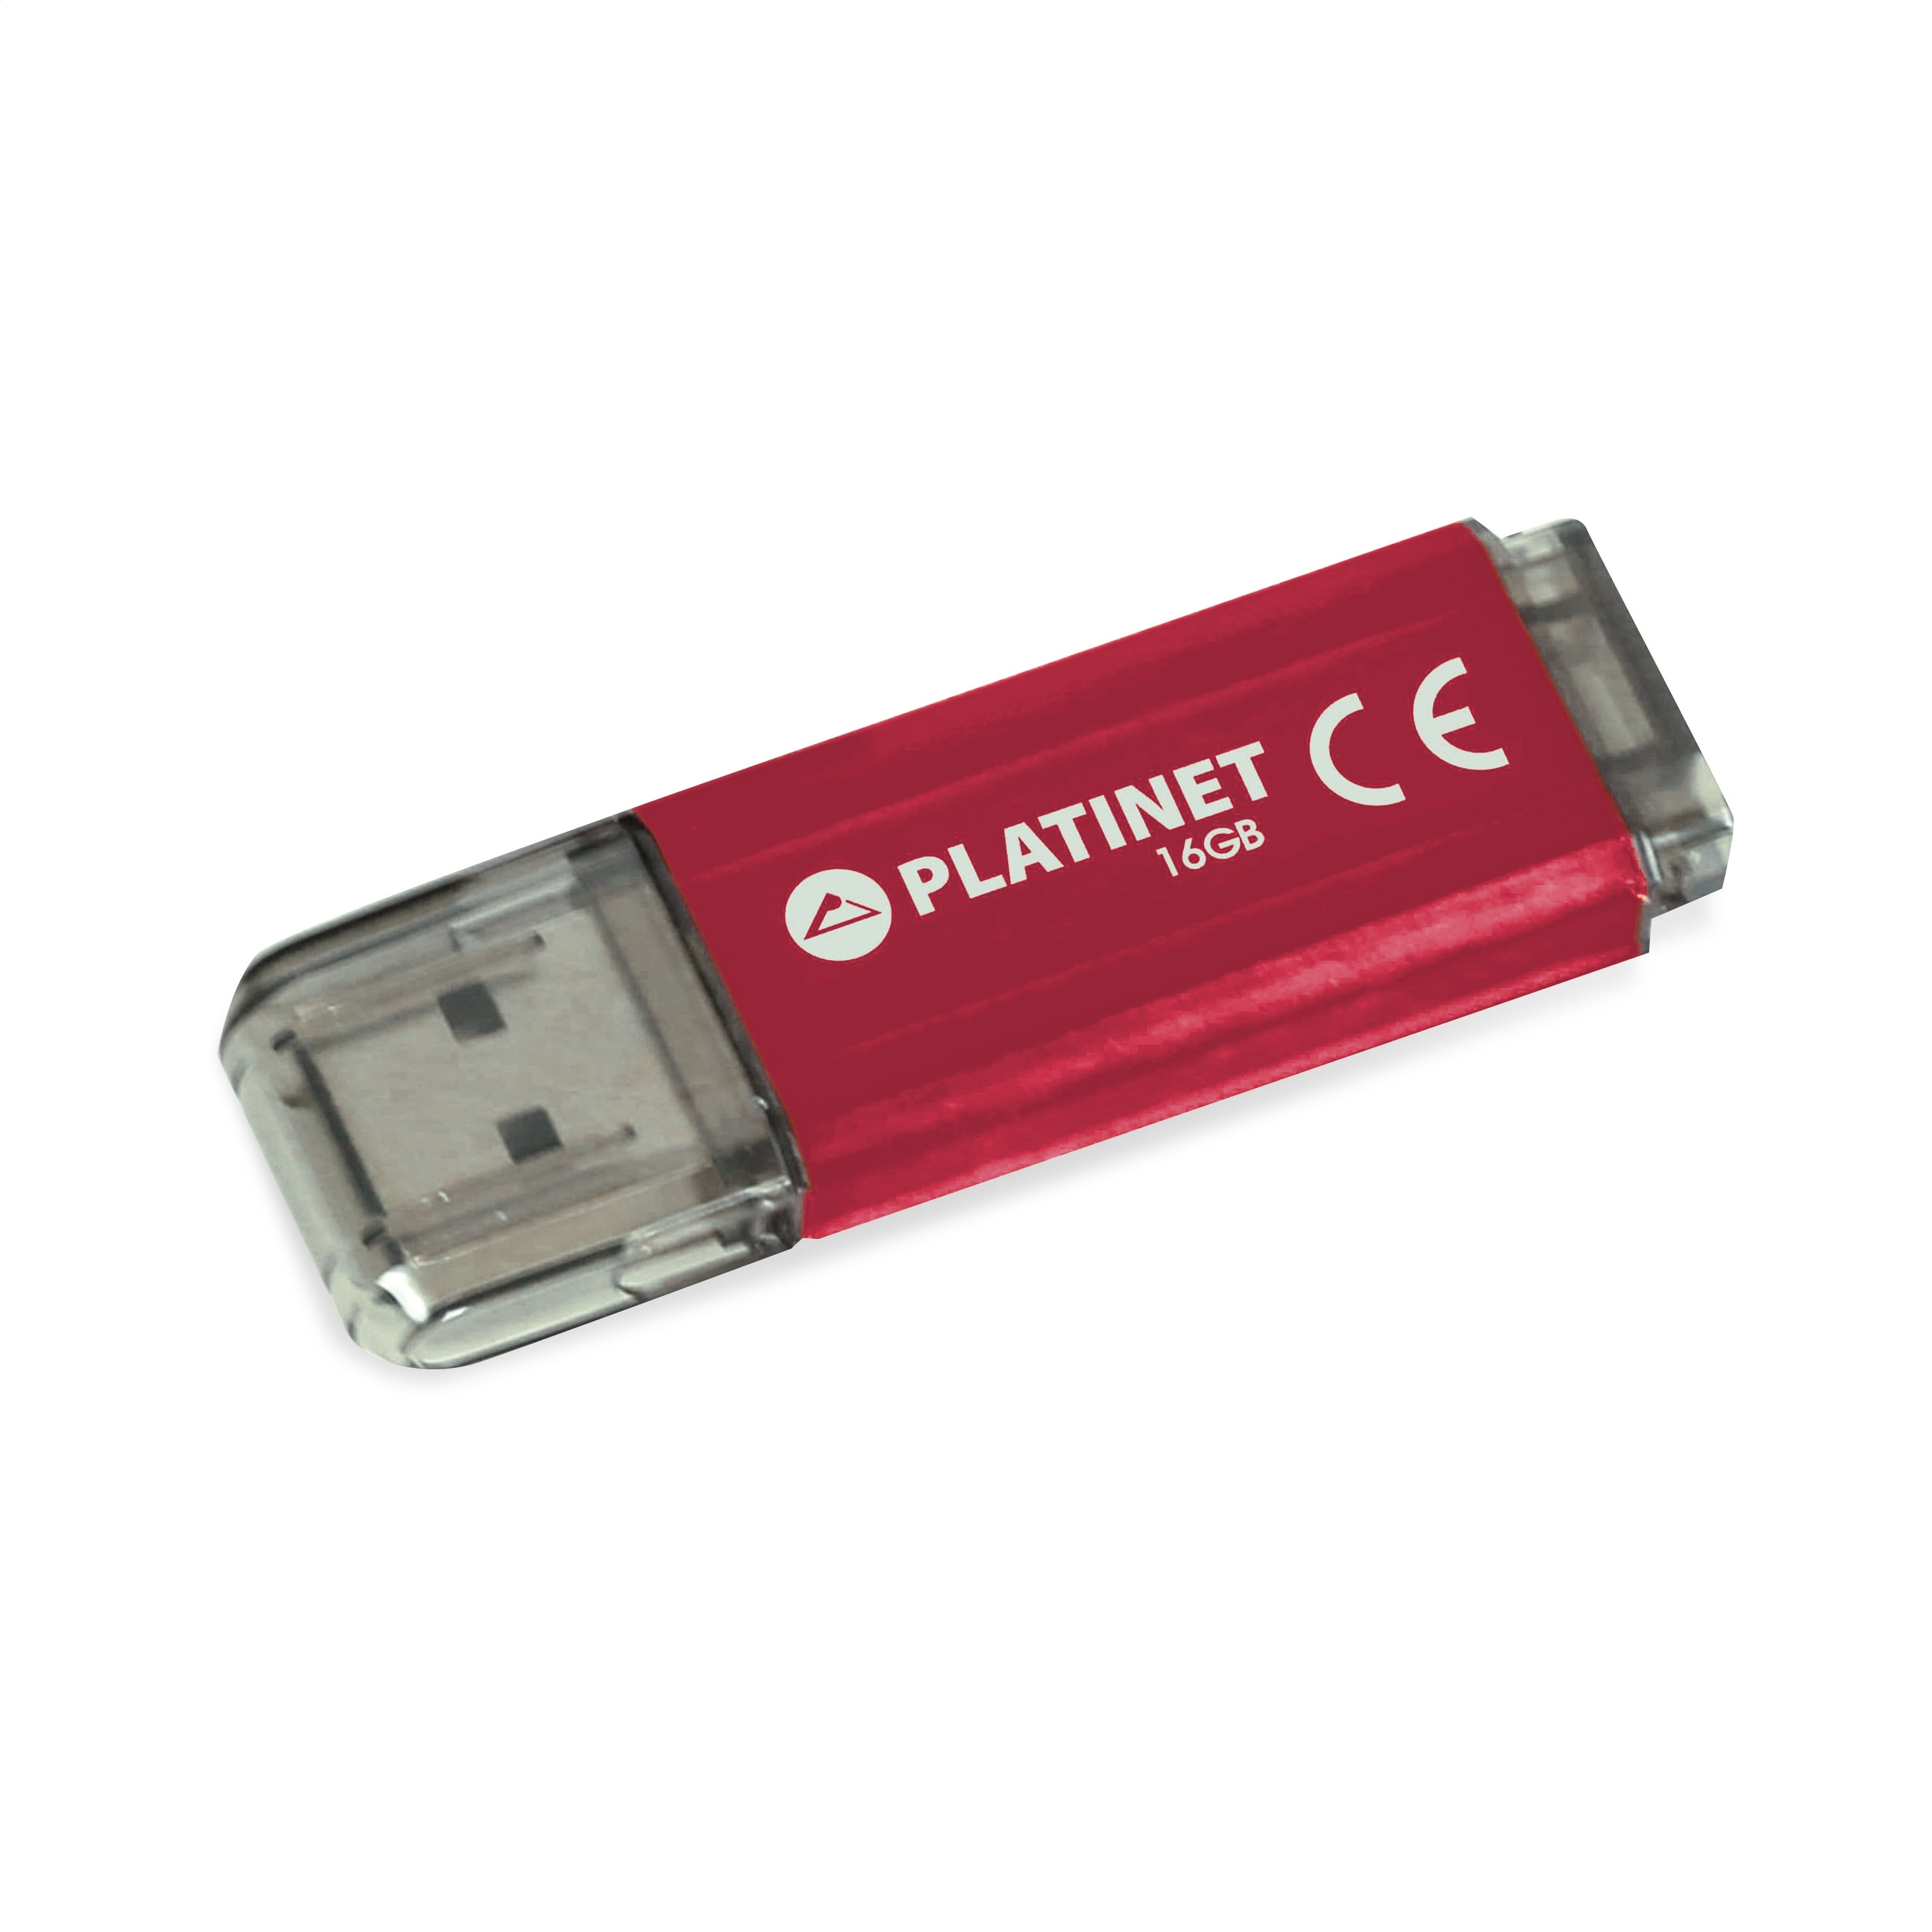 PLATINET PENDRIVE USB 2.0 V-Depo 16 GB ČERVENÉ [42178]